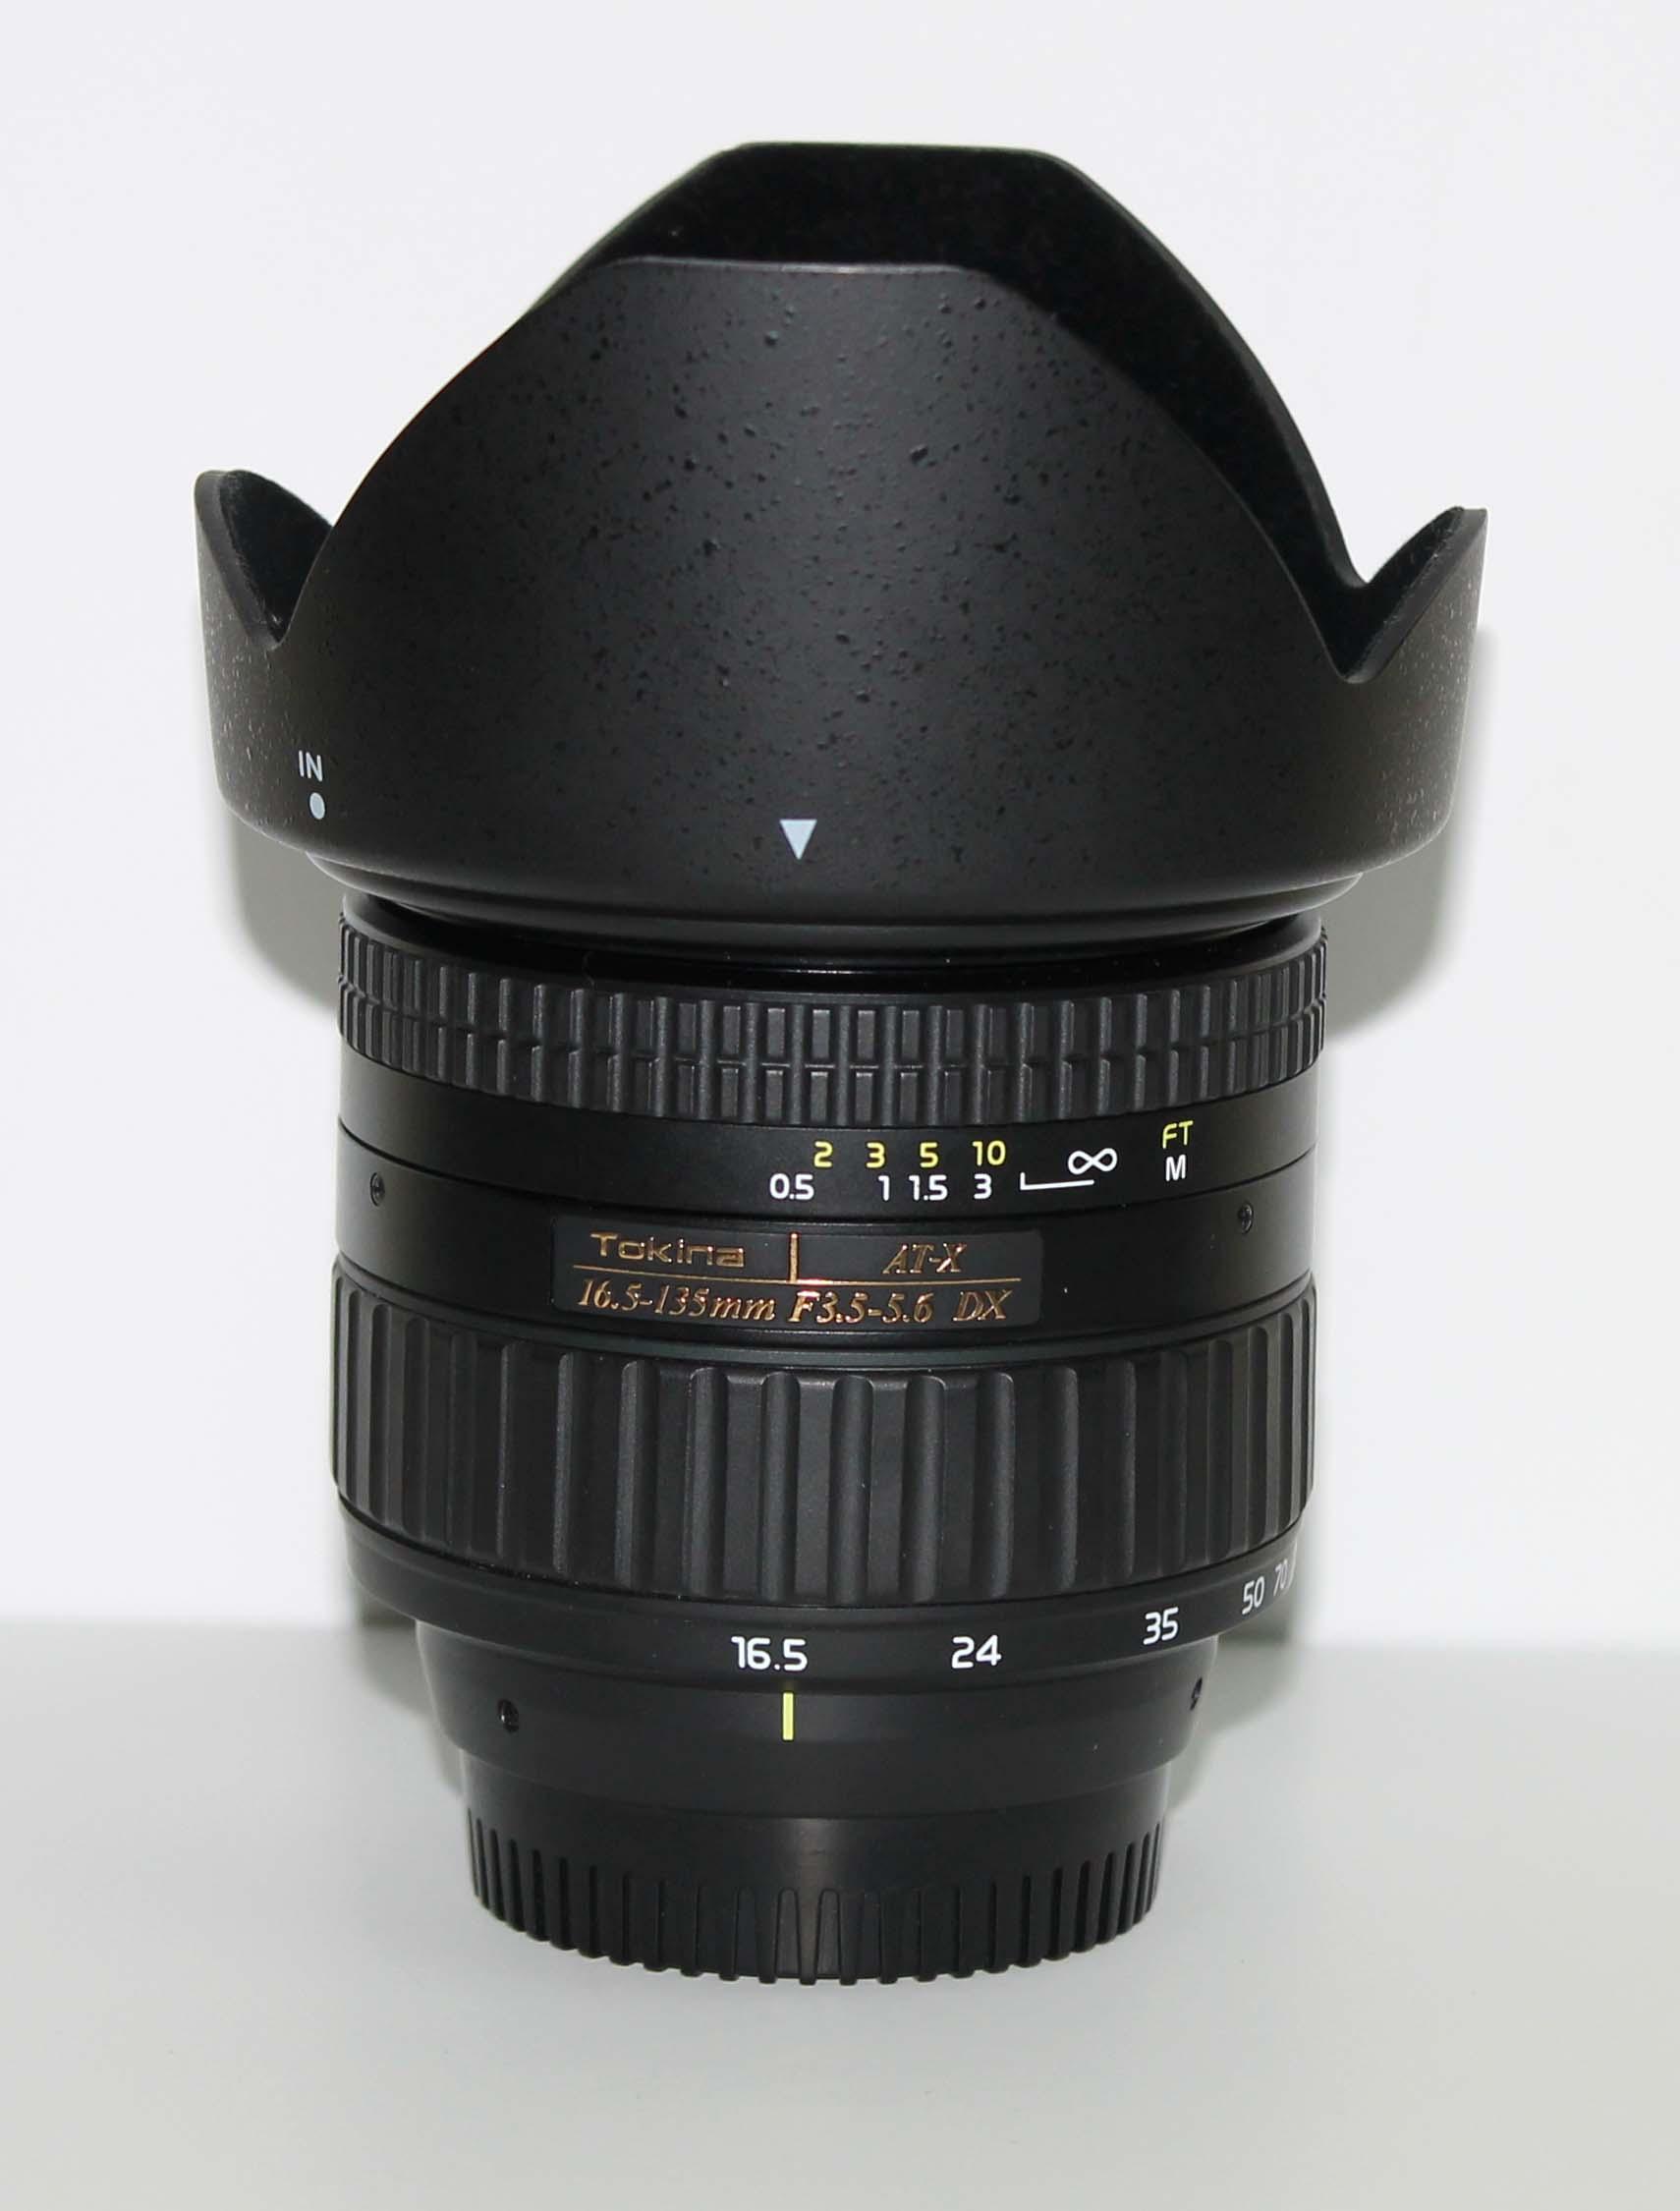 Объектив Tokina AT-X 16.5-135 mm DX f/3.5-5.6  Nikon